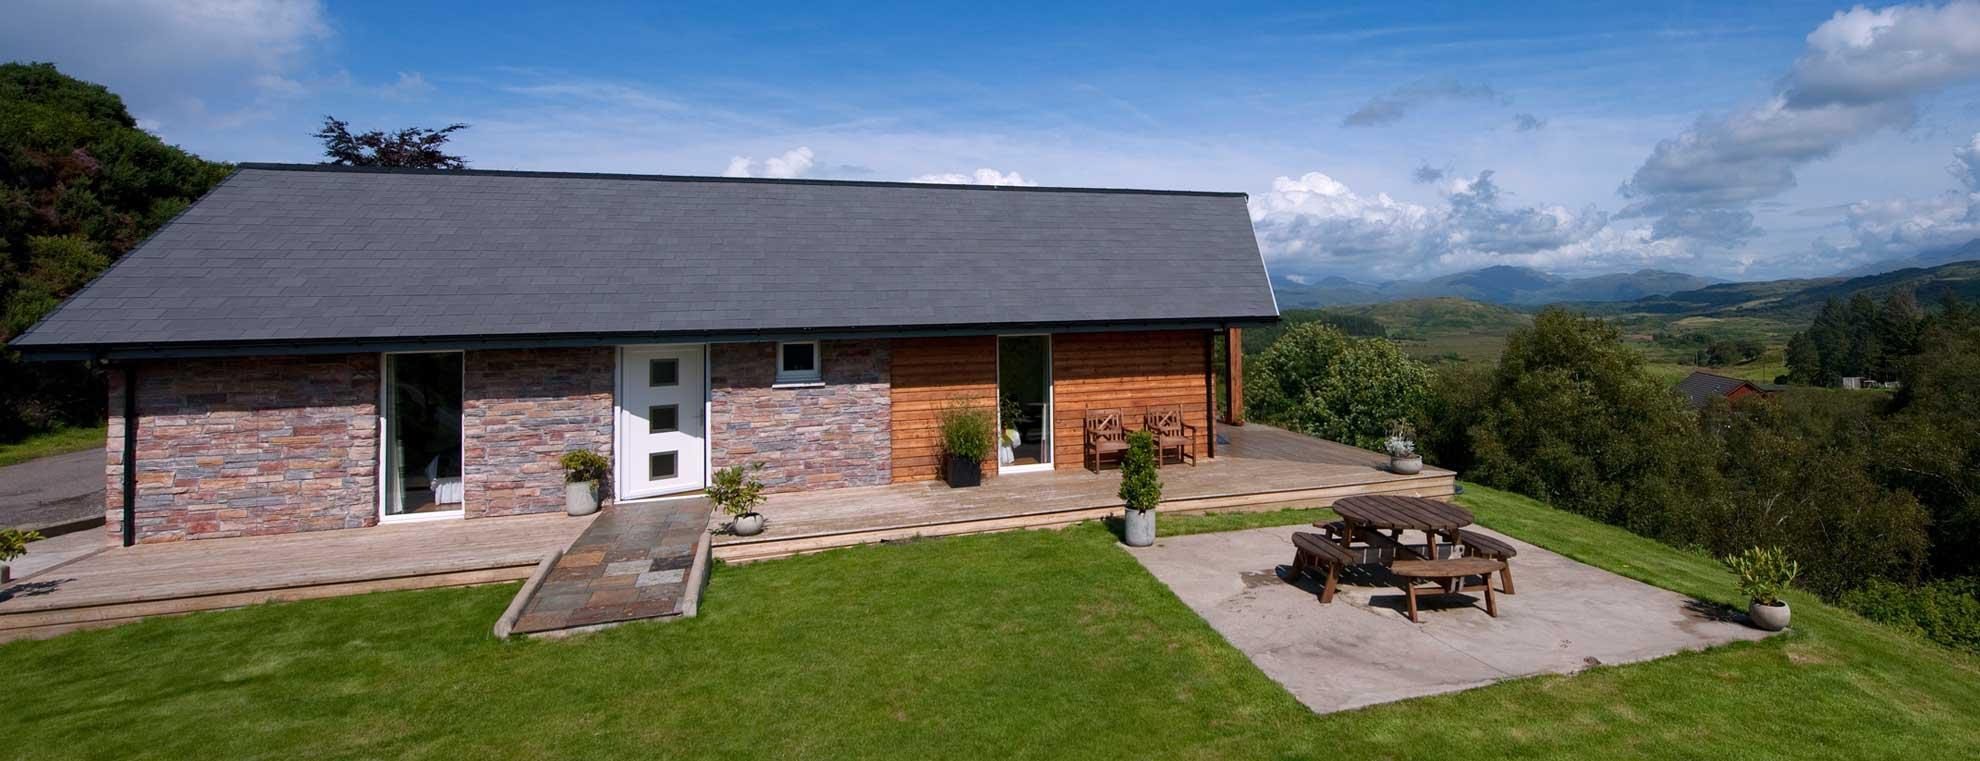 Aspen-Lodge